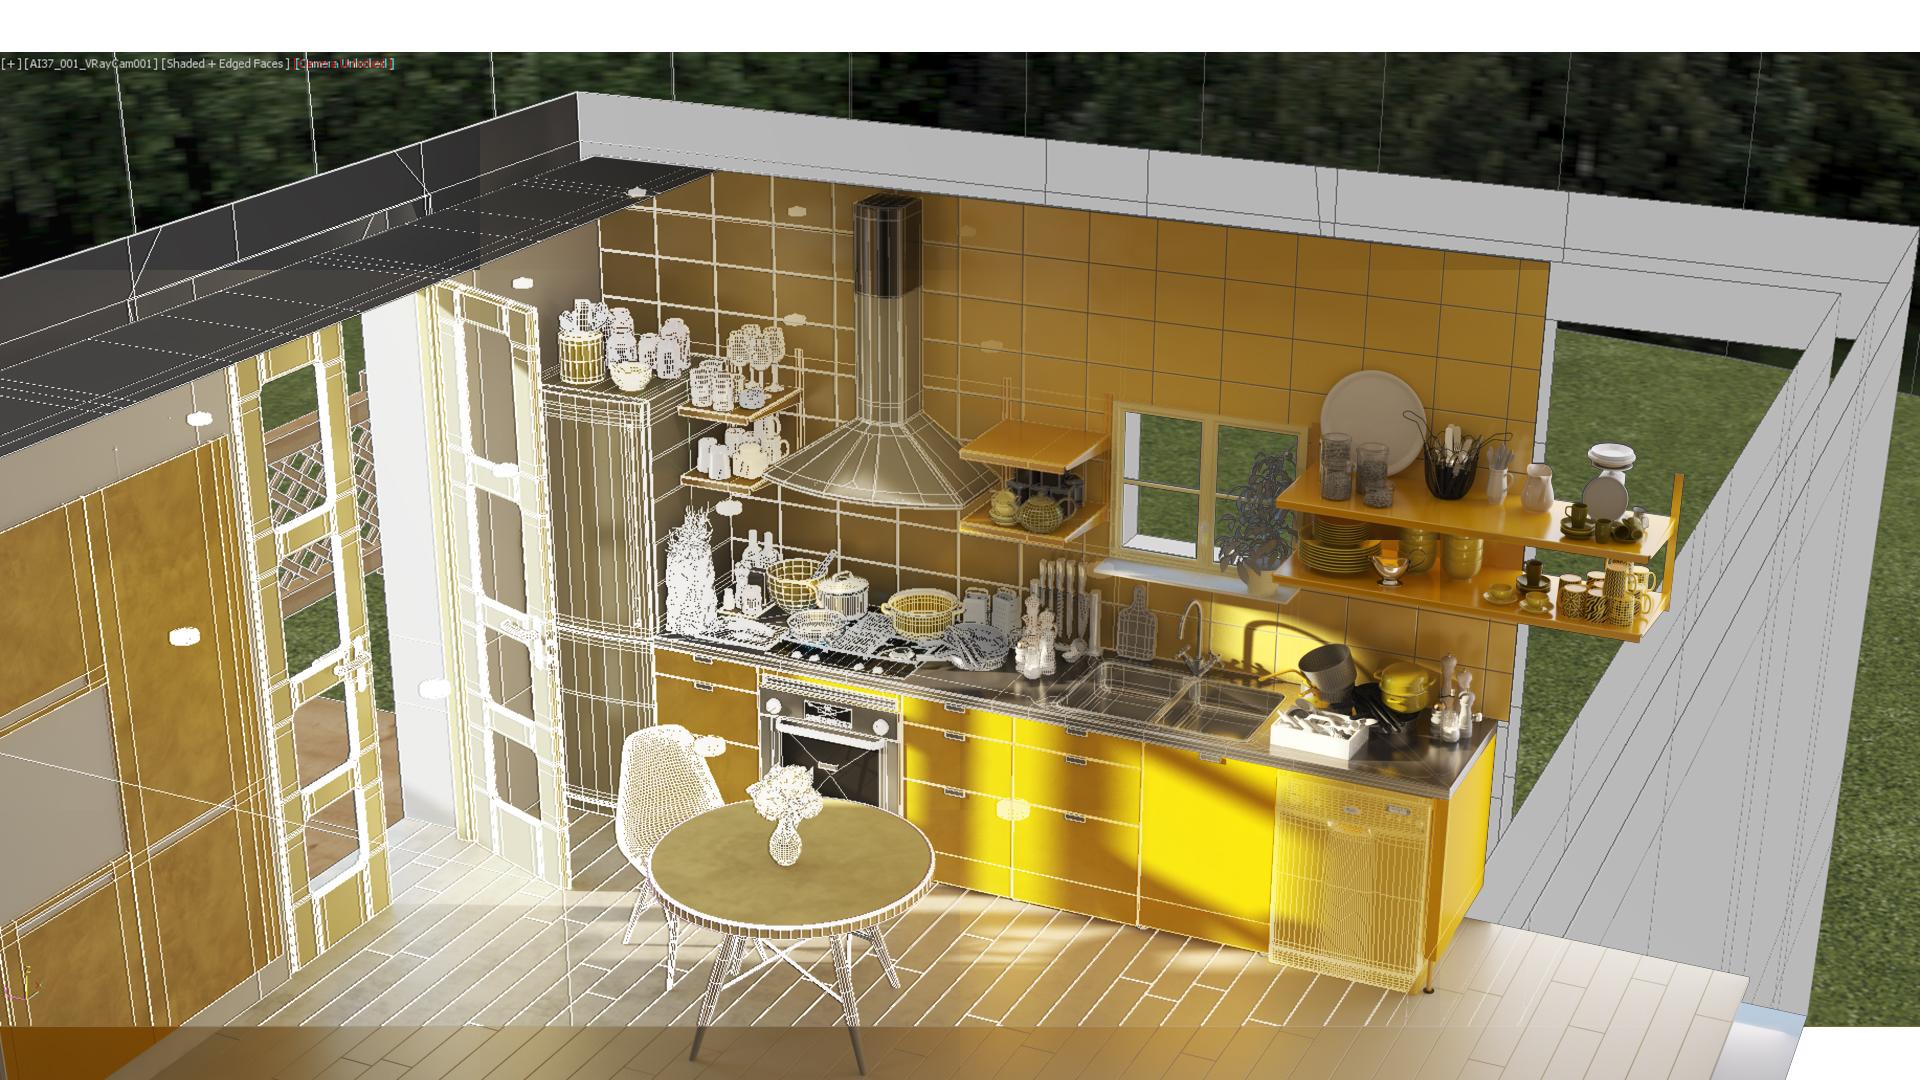 Yellow_Room_CGI_3quart_001.JPG